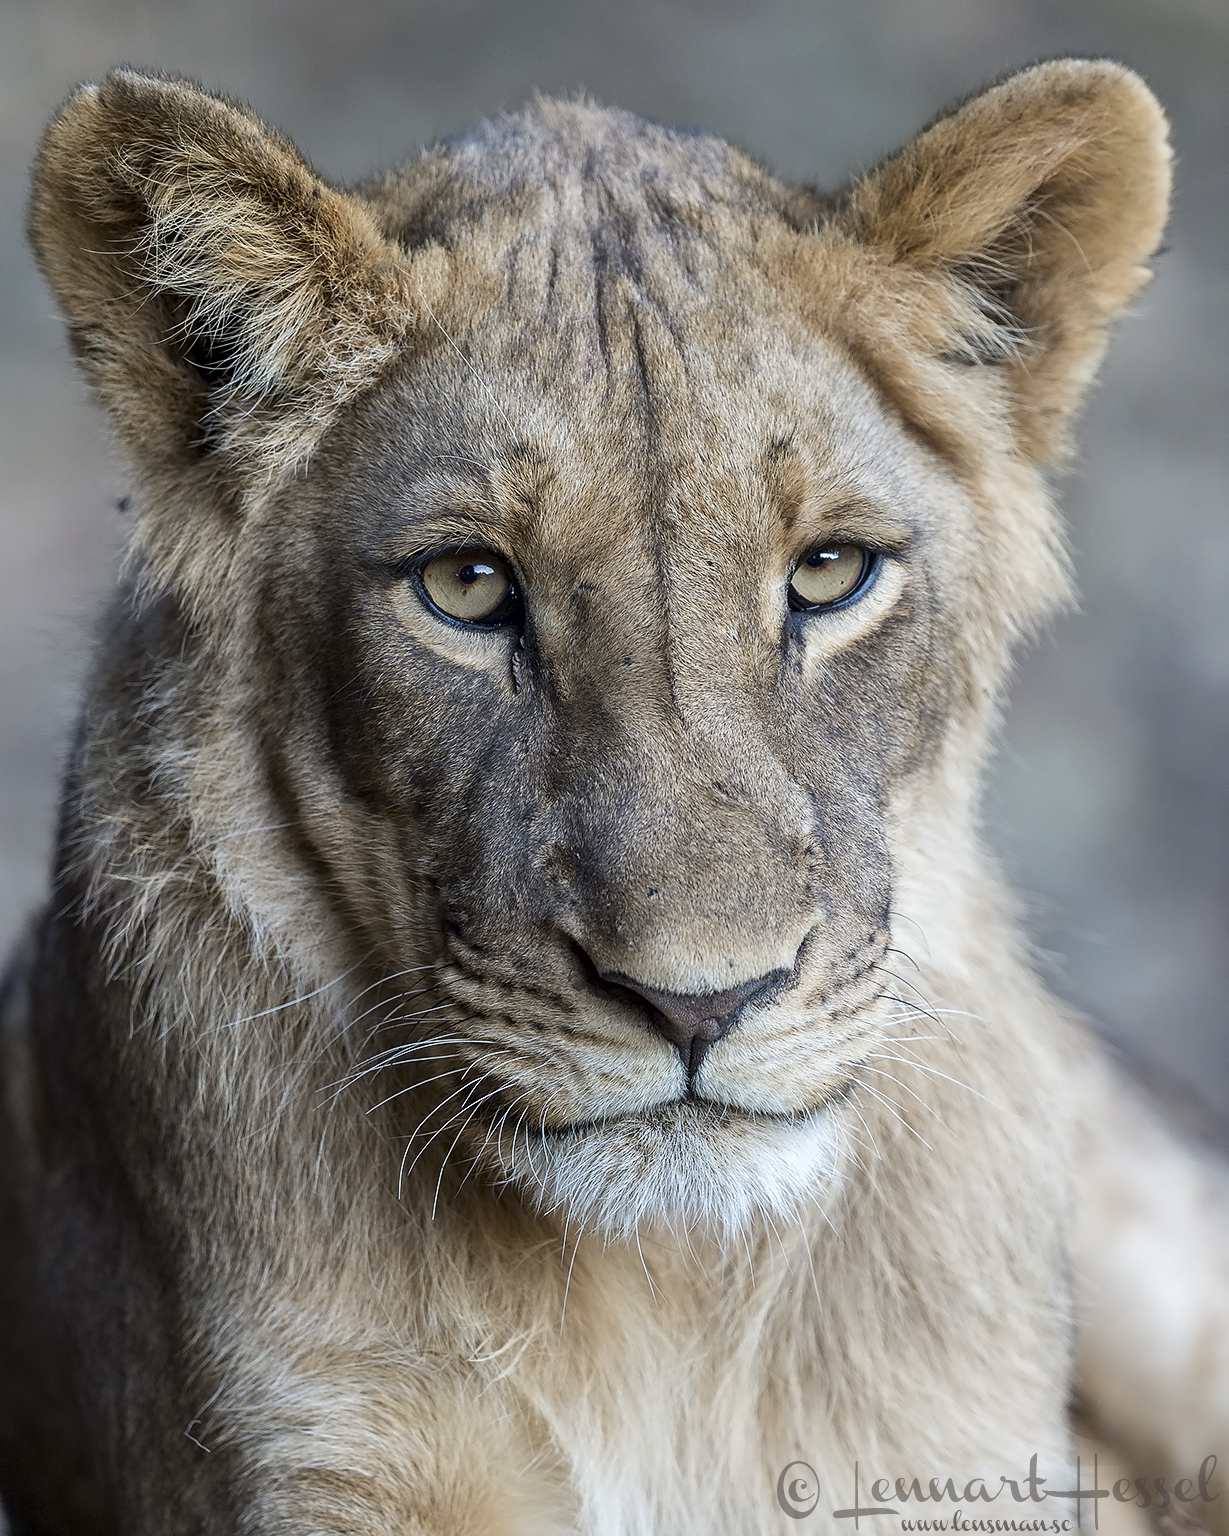 Young male Lion giants Mana Pools National Park, Zimbabwe